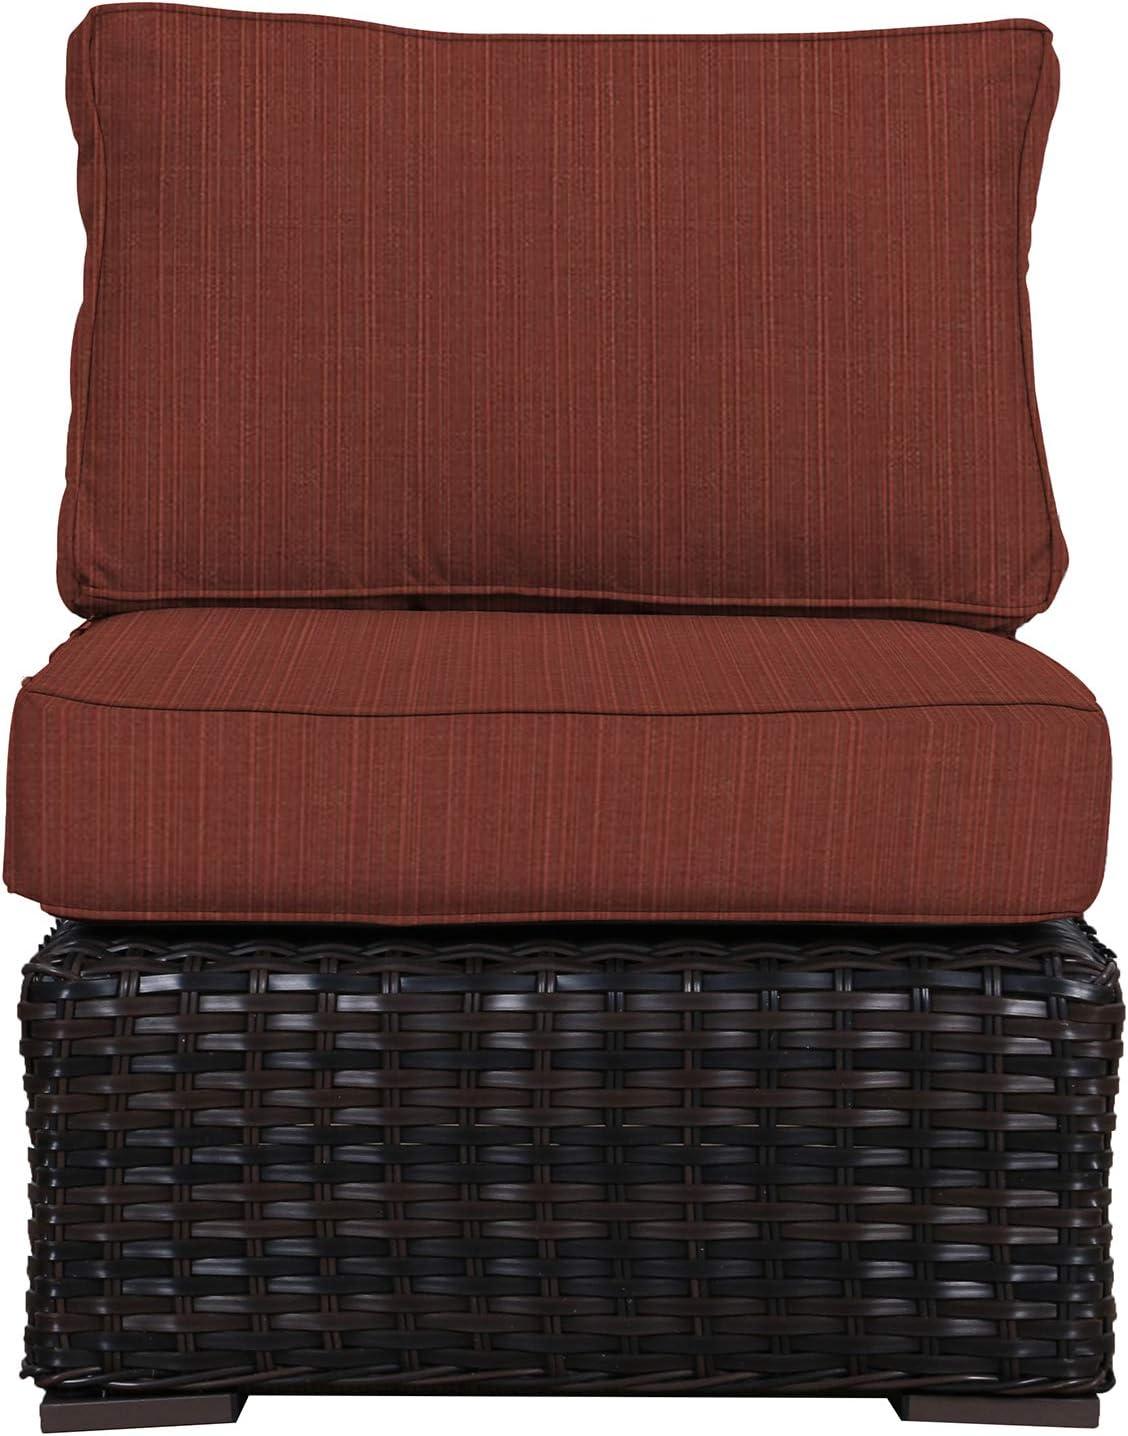 Amazon Com Envelor Santa Monica Outdoor Patio Furniture Wicker Rattan Middle Of Sectional Includes Burgundy Sunbrella Cushions Garden Outdoor